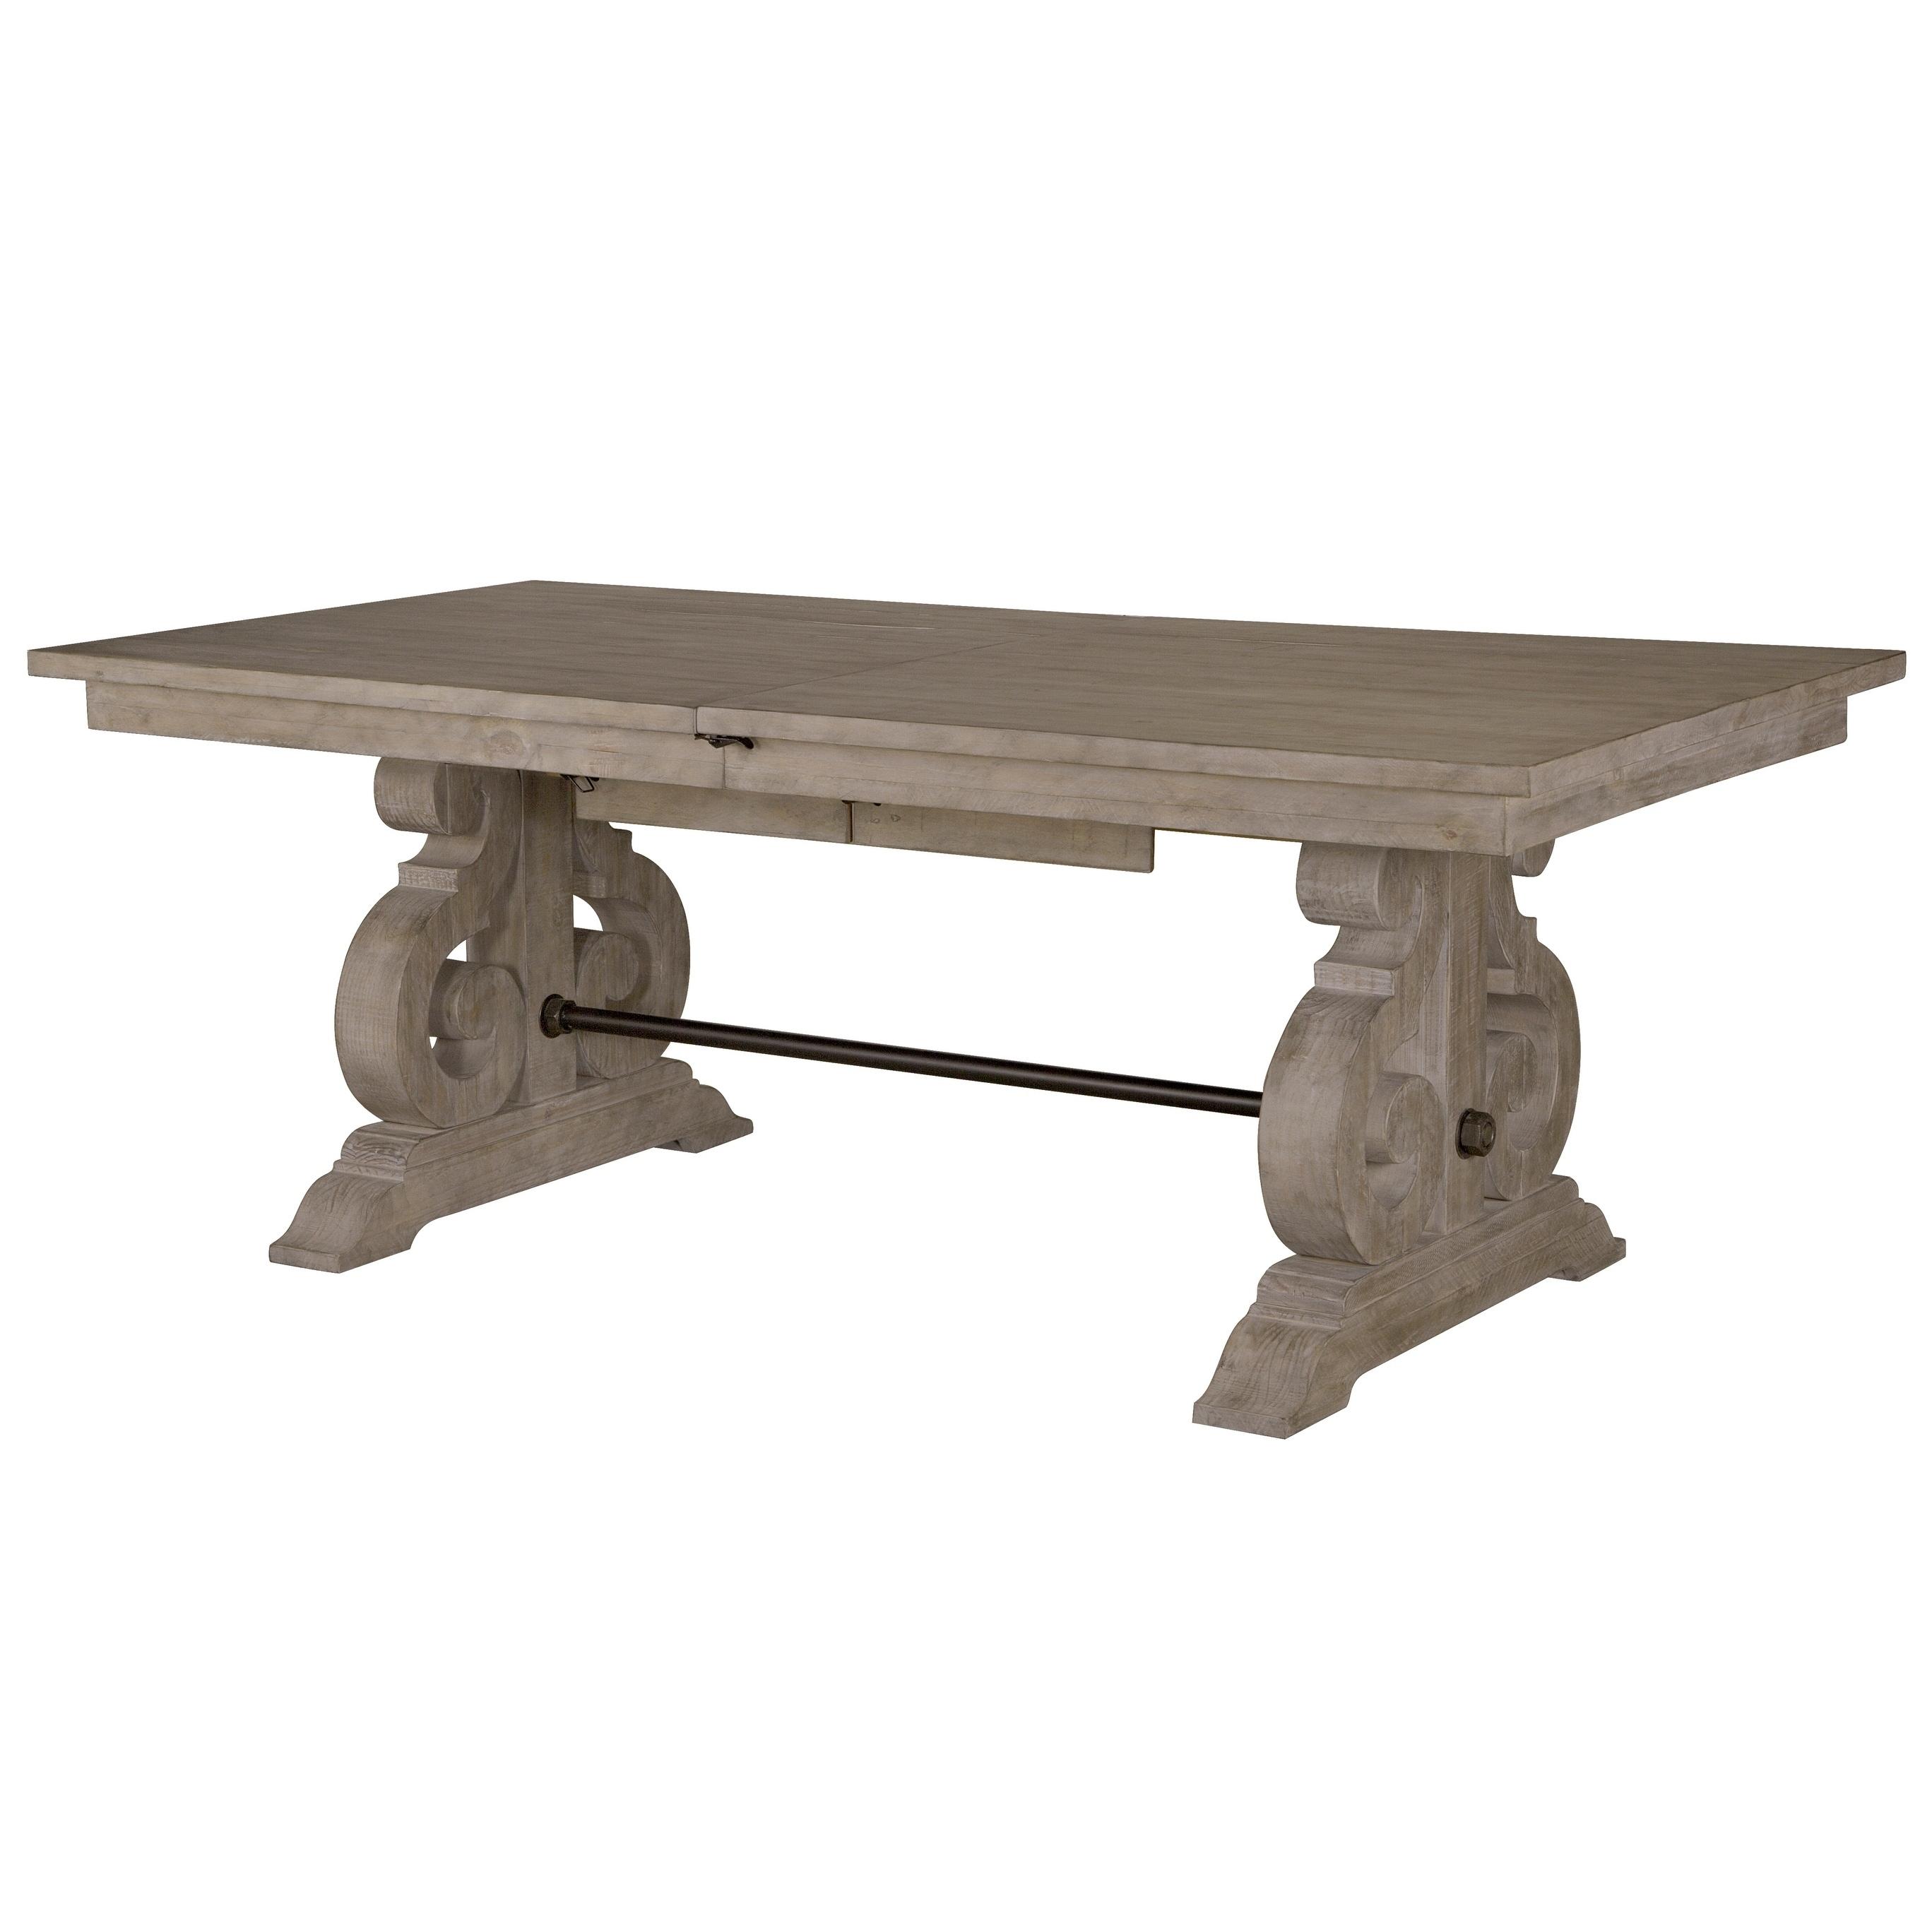 The Gray Barn Manderley Dove Tail Grey Dining Table